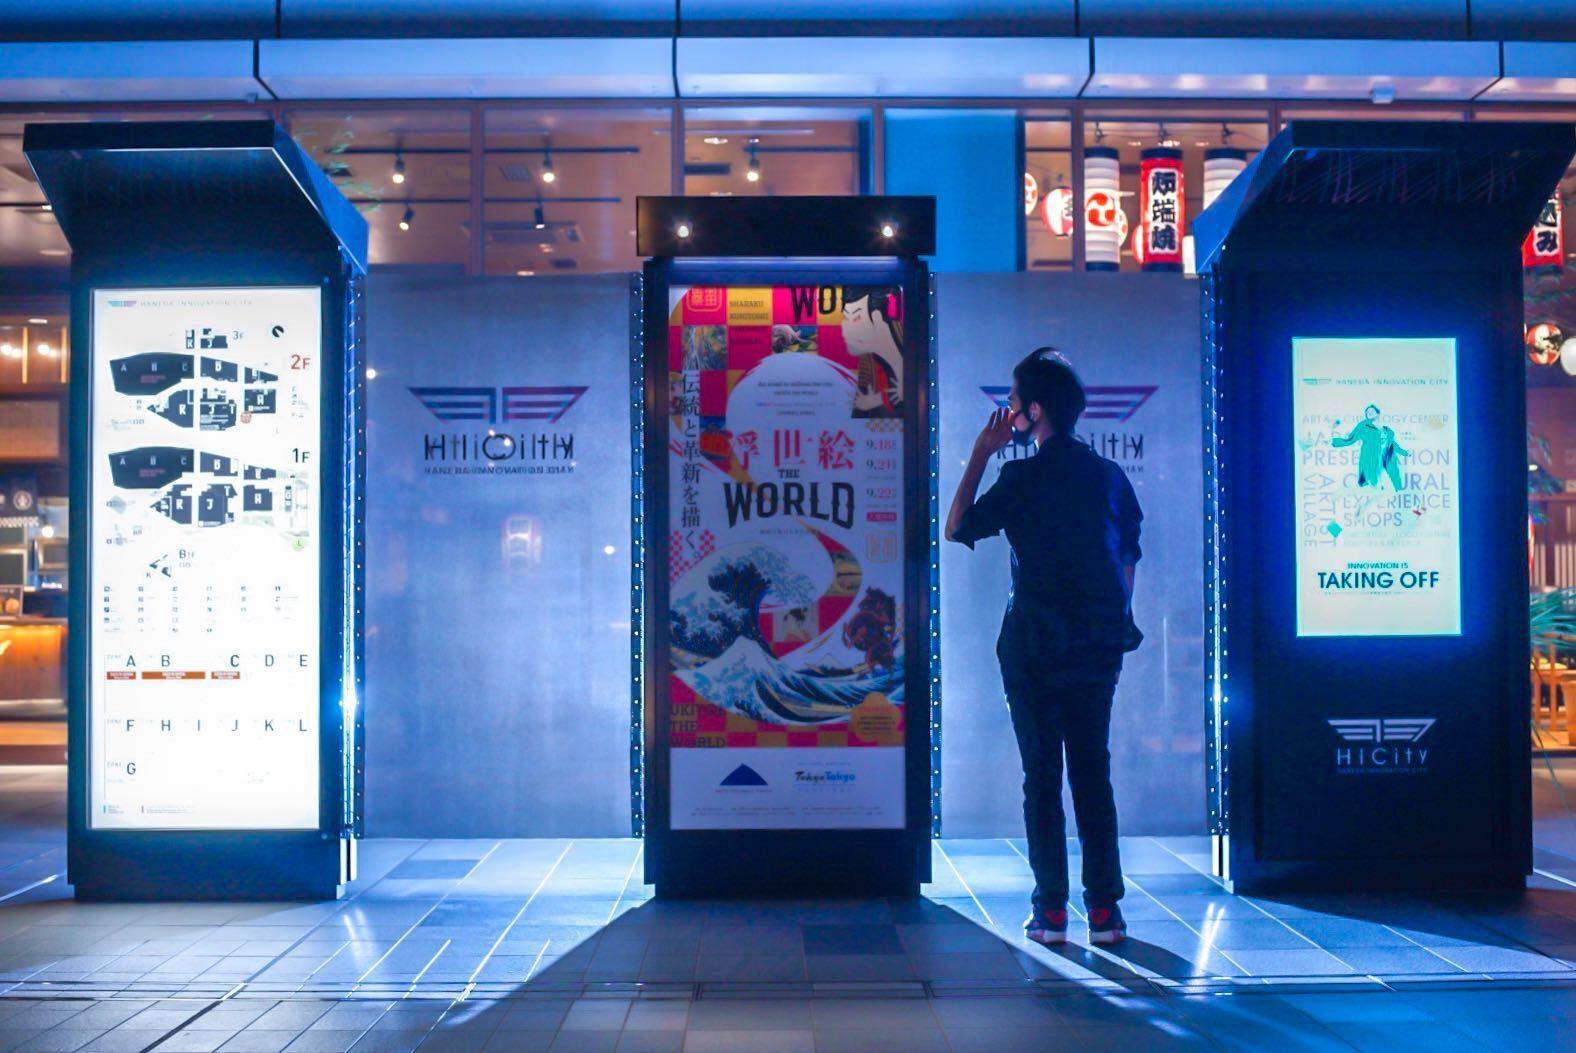 【GATARI】羽田イノベーションシティオープニングイベント「浮世絵 THE WORLD」へ音声AR体験を提供